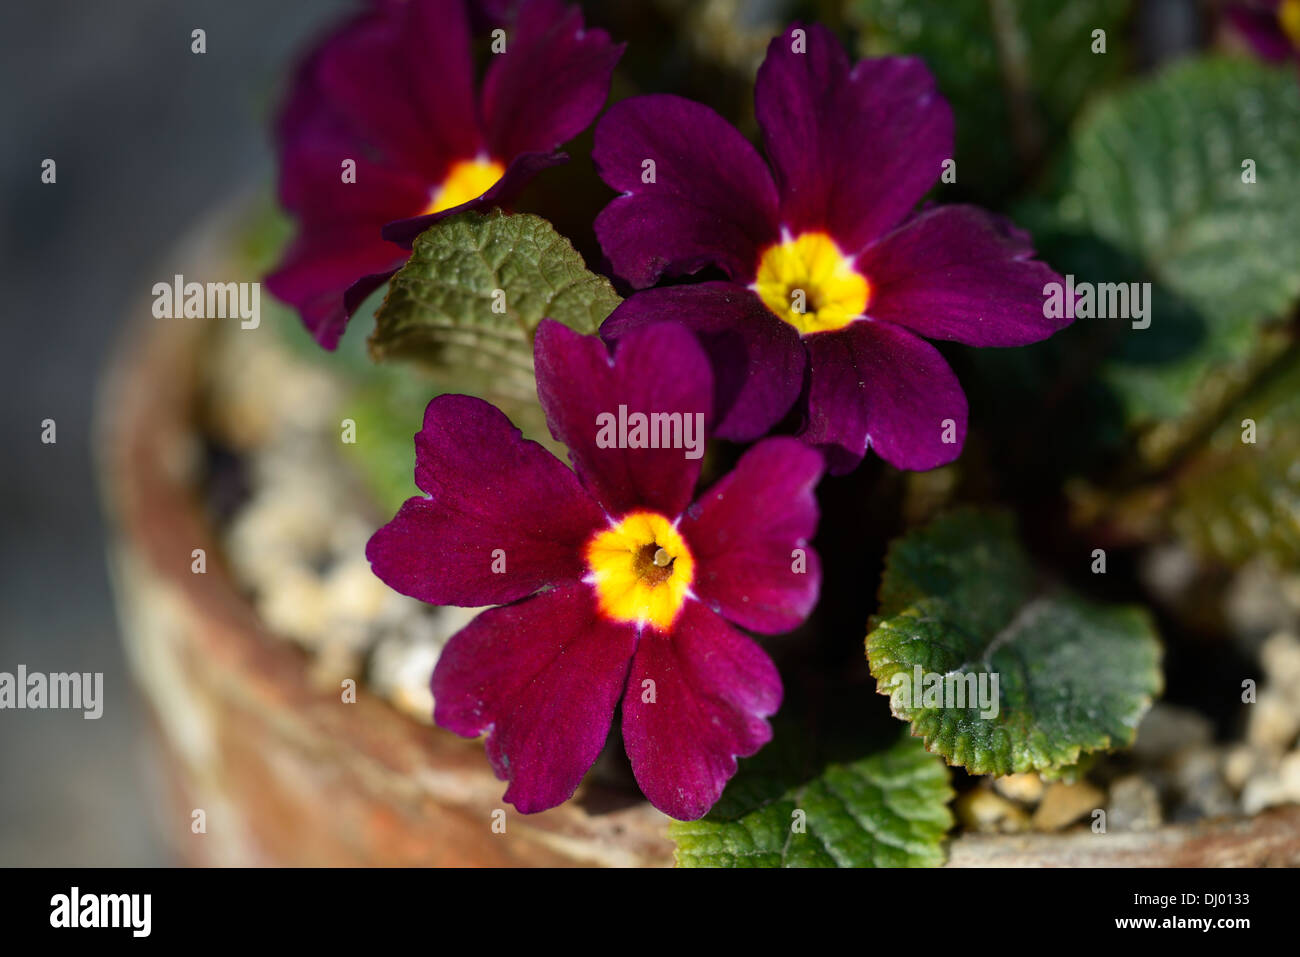 primula julius caesar closeups close ups purple flowers flowering blooms blossoms yellow eye - Stock Image